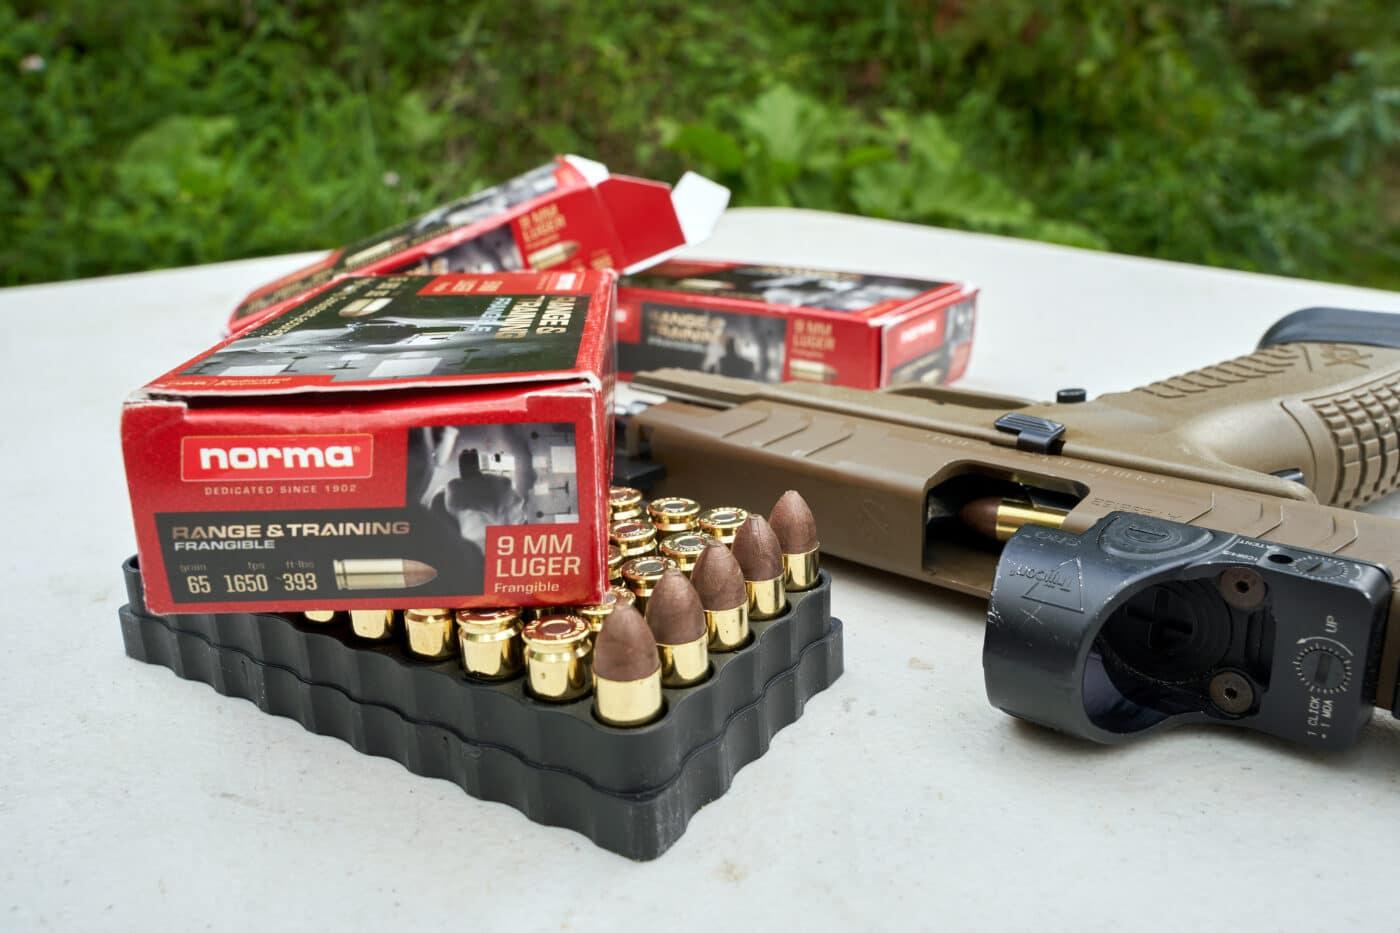 Norma Range and Training Frangible ammunition next to Springfield pistol